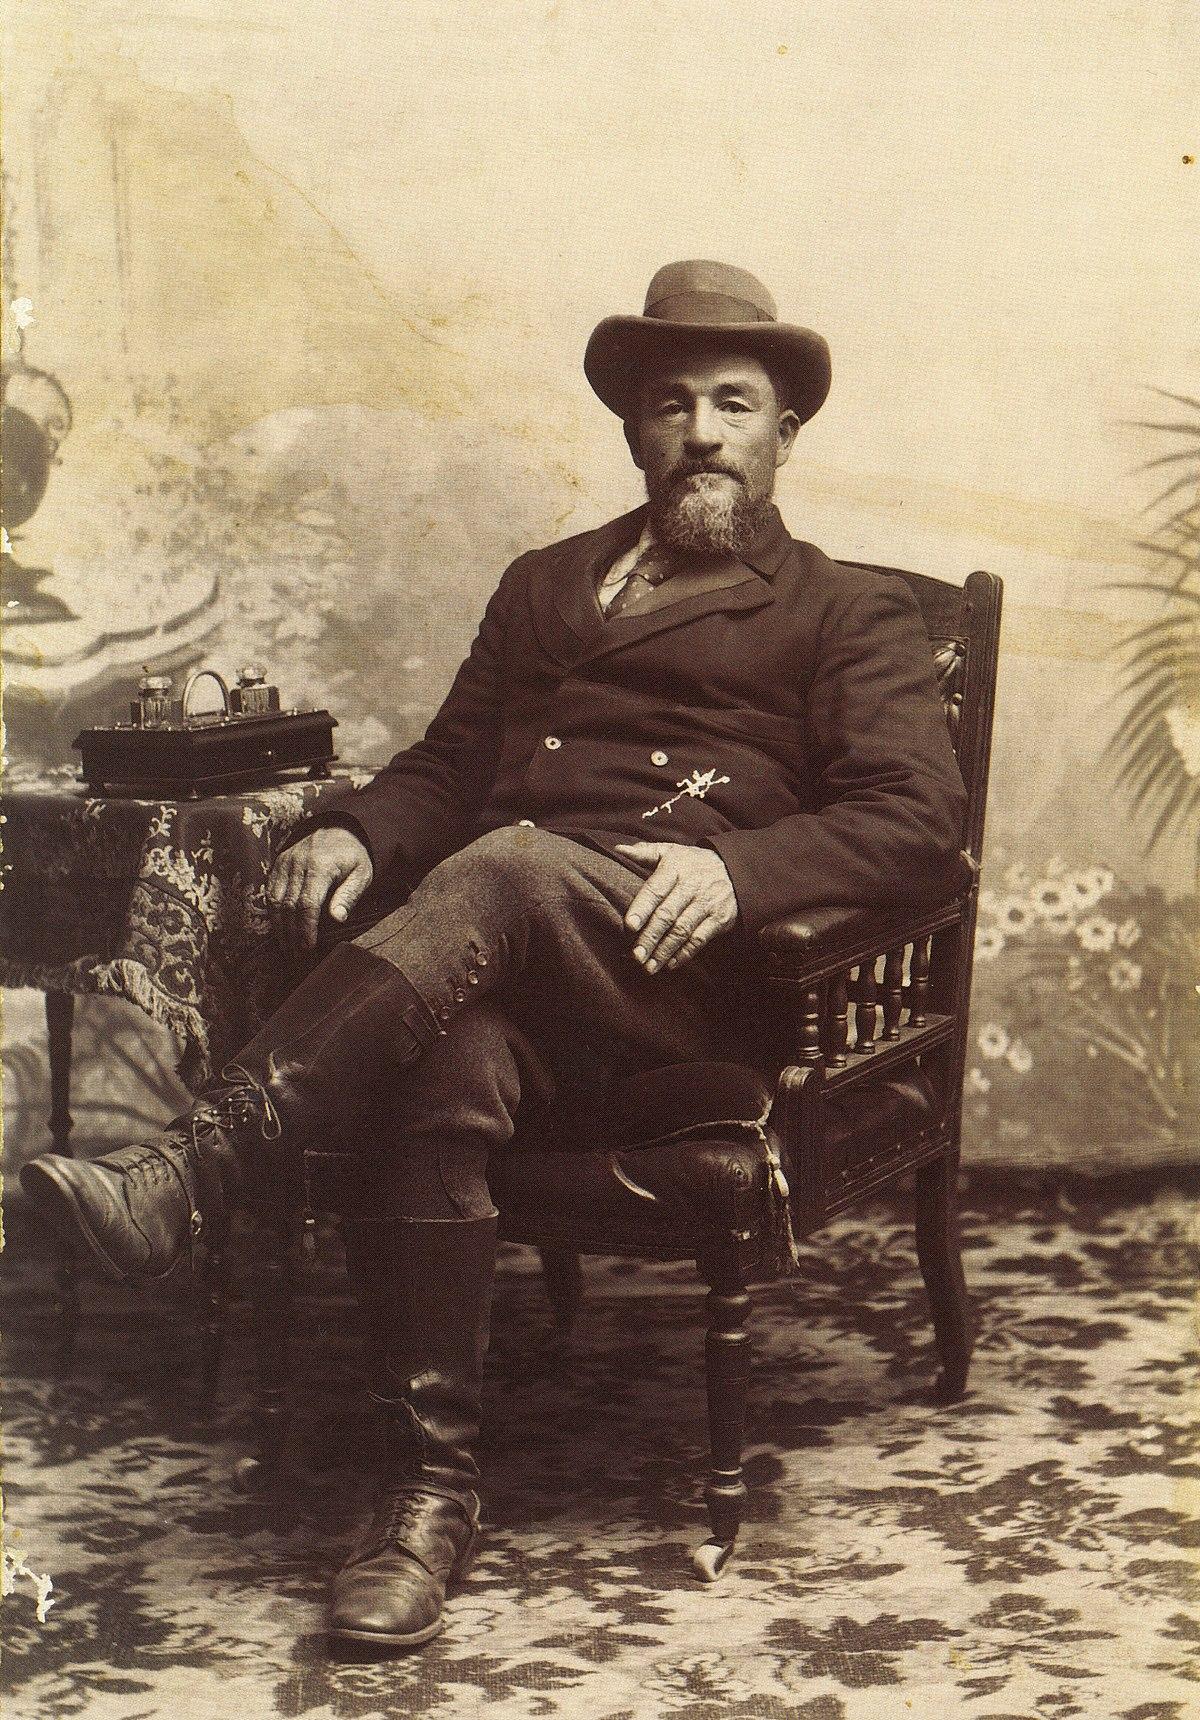 File:Generaal Christiaan de Wet - Bloemfontein 6.6.1902.jpg - Wikimedia  Commons